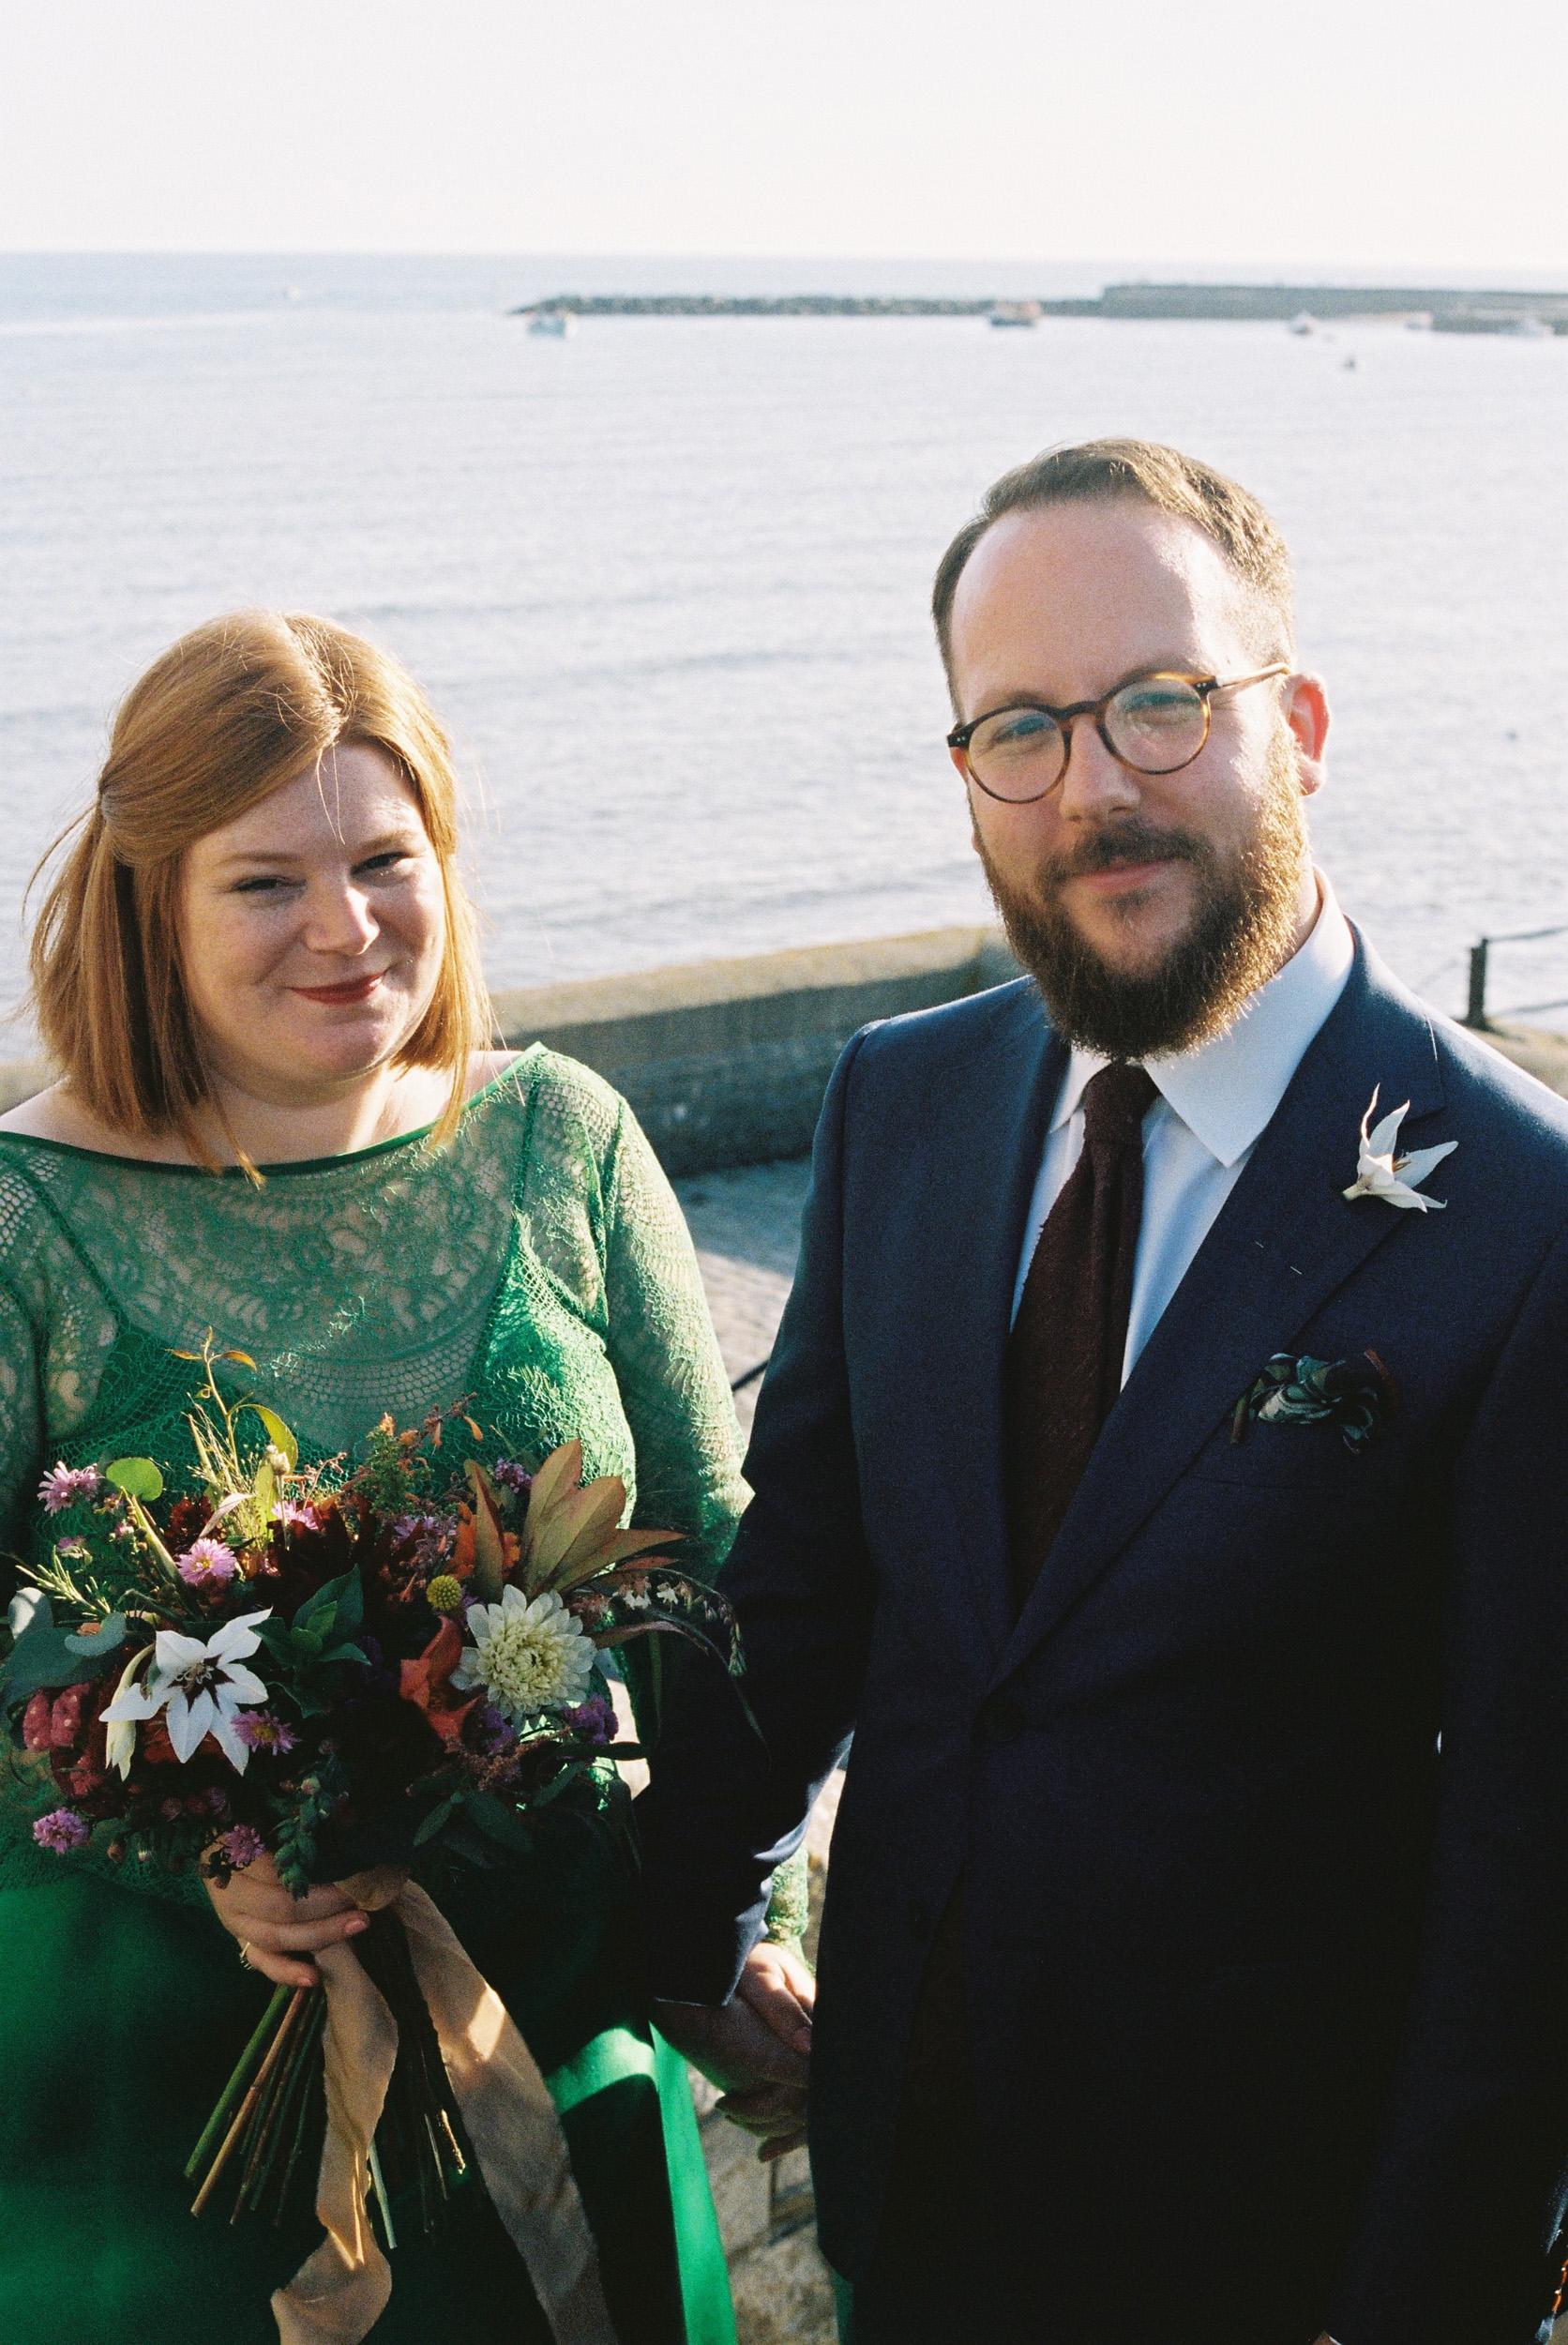 Lucy-Bespoke-Green-Silk-Lace-Wedding-Dress-Kate-Beaumont-Sheffield-7.jpg